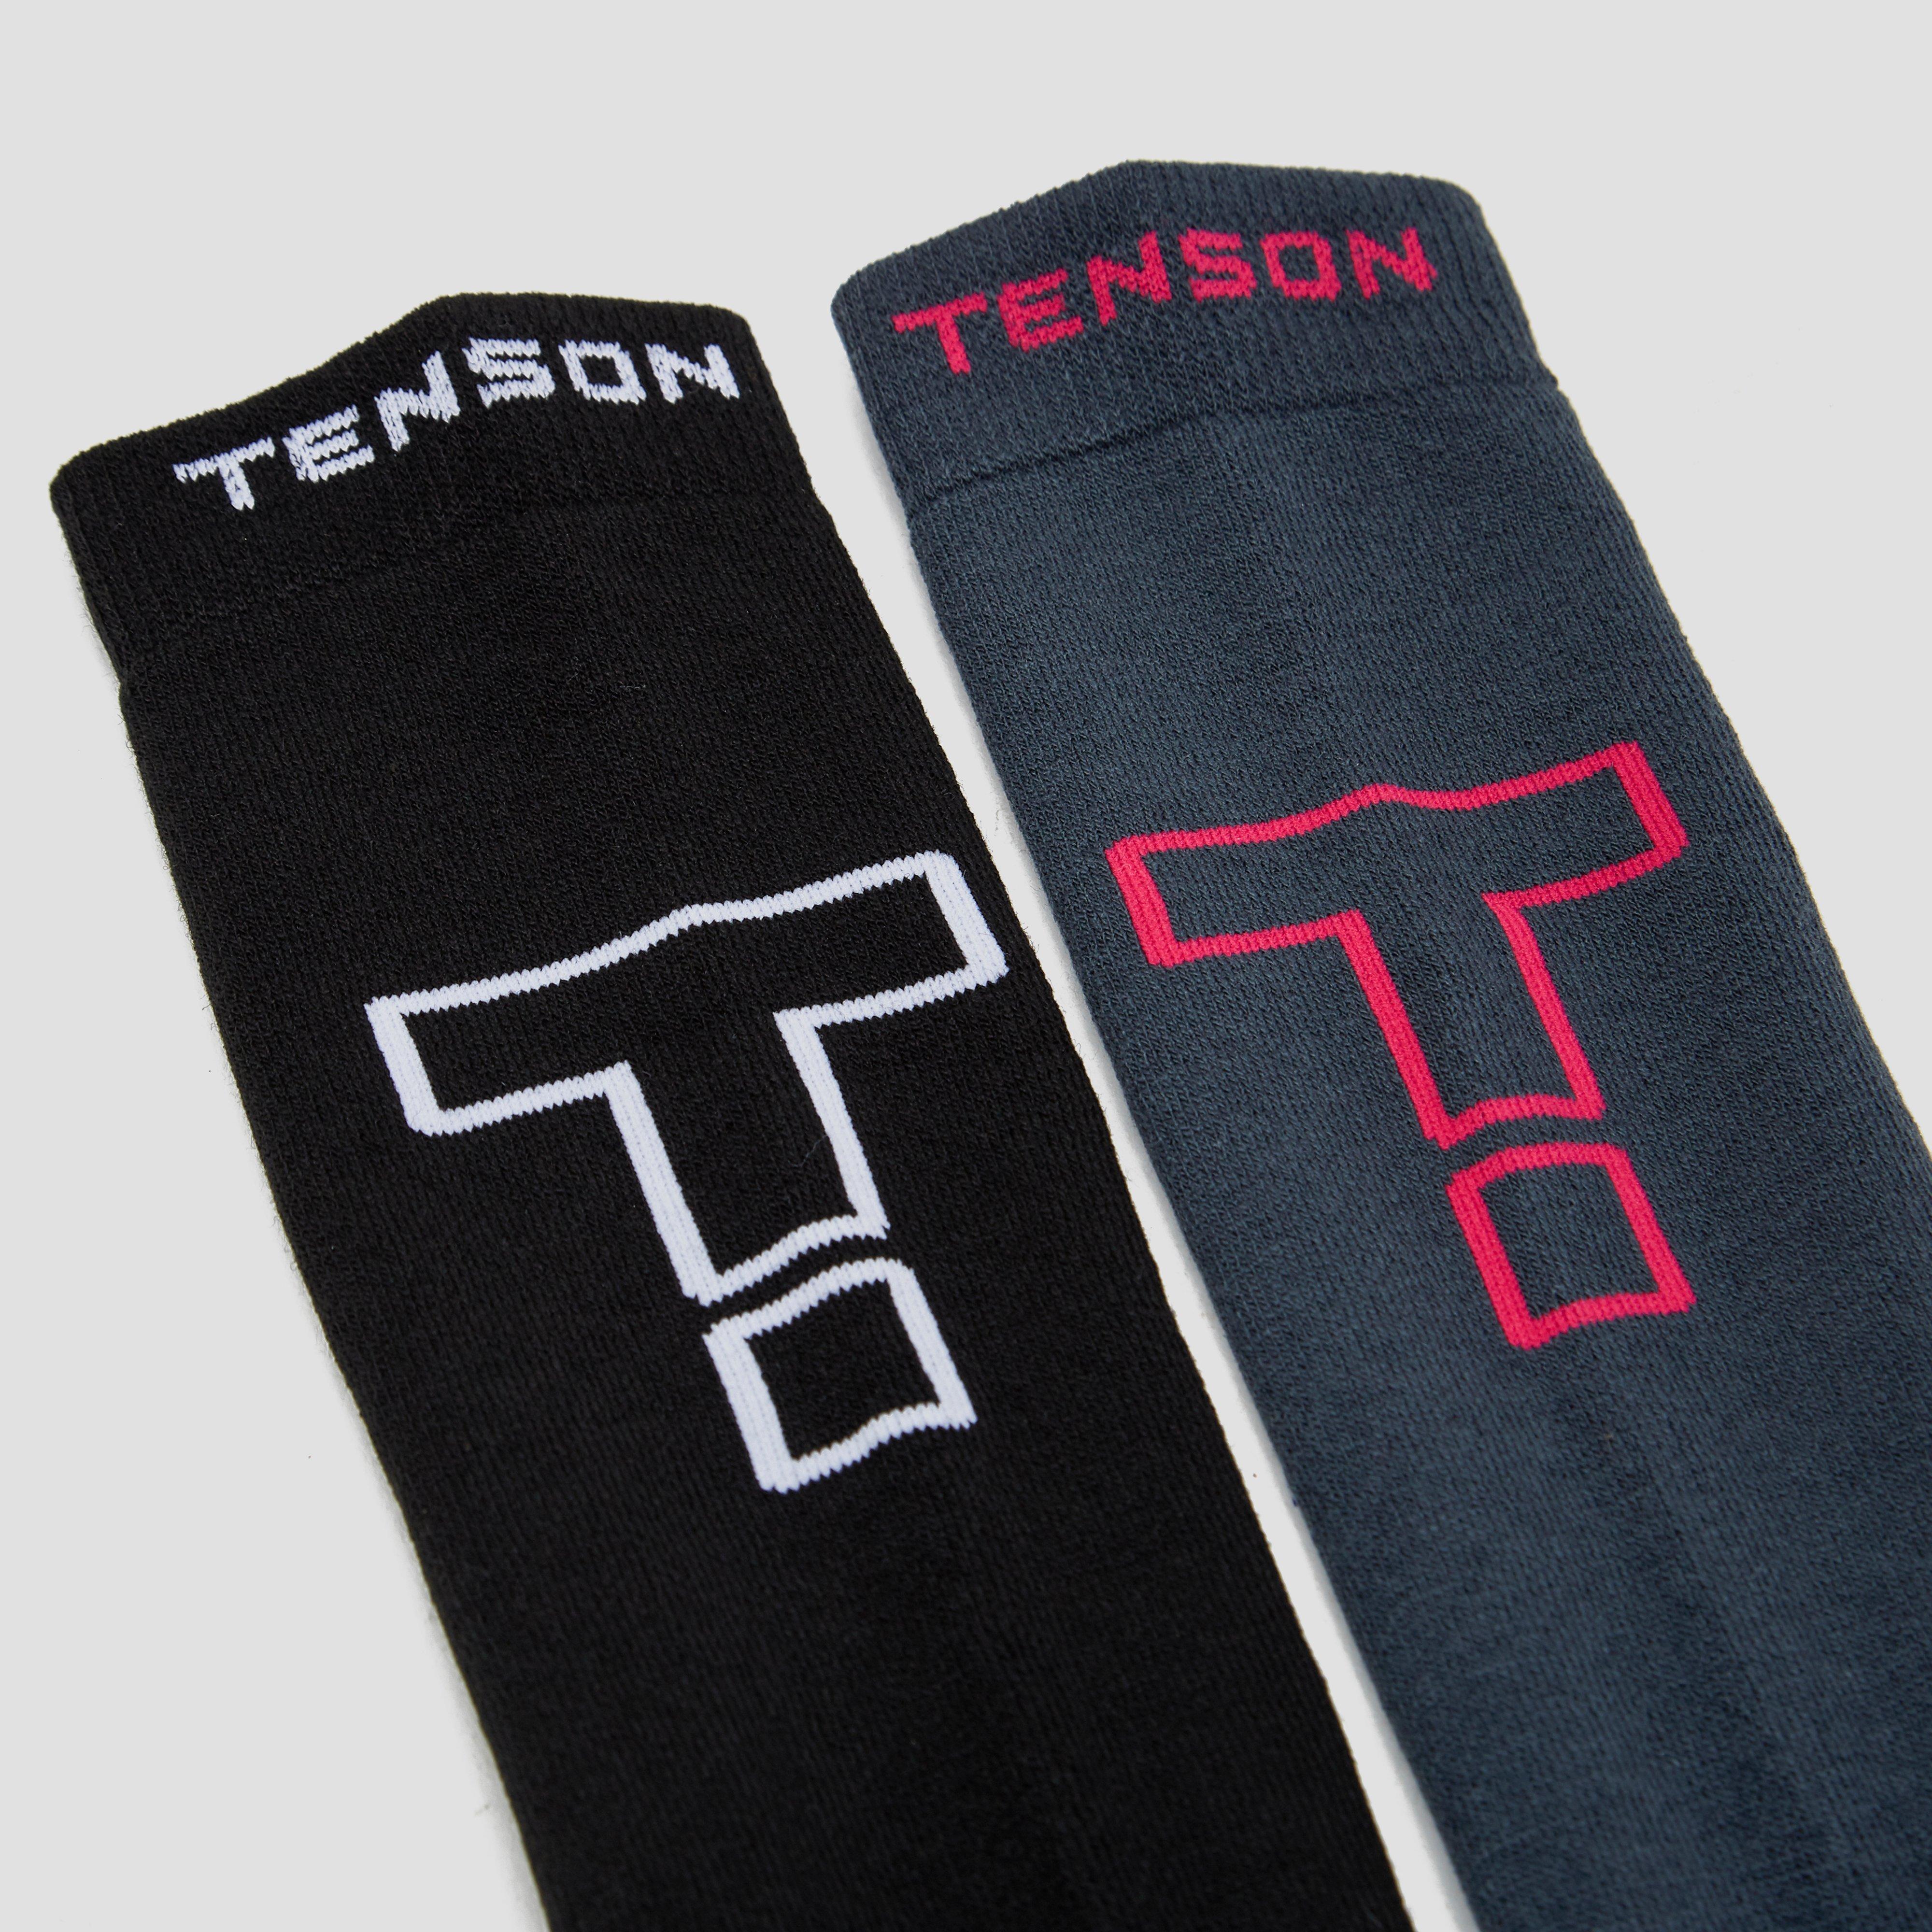 TENSON CORE PERFORMANCE SKISOKKEN 2-PACK ZWART/WIT EN GRIJS/ROZE DAMES